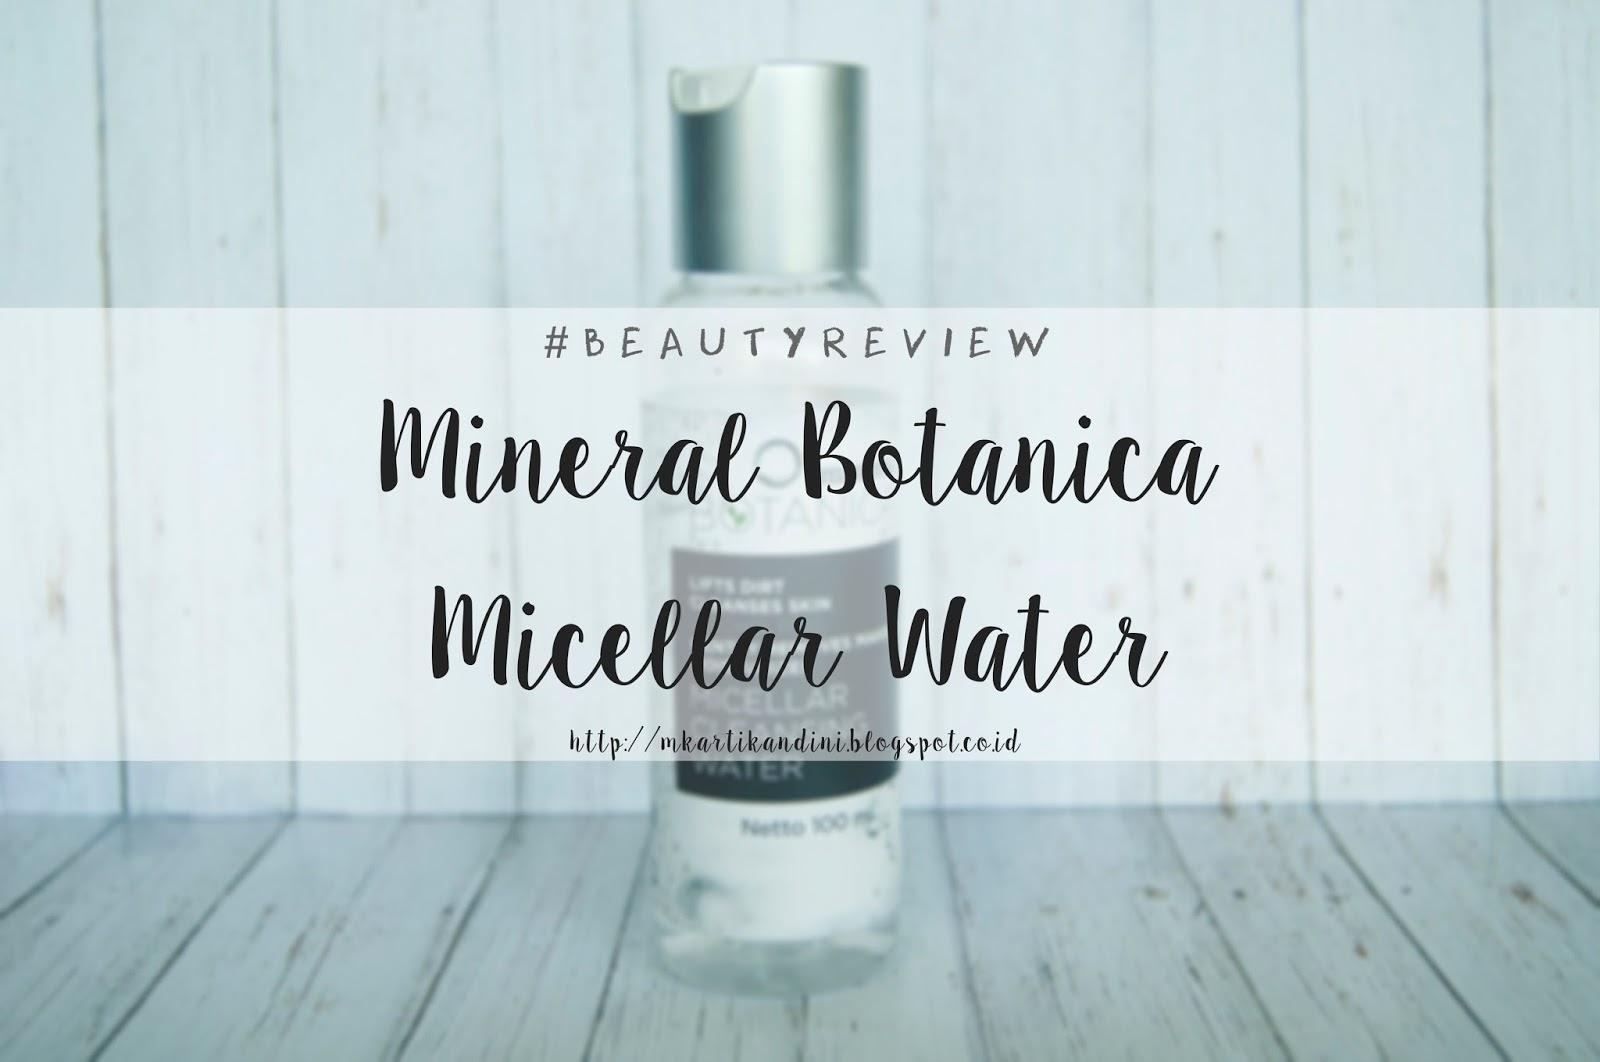 Mineral Botanica Micellar Water